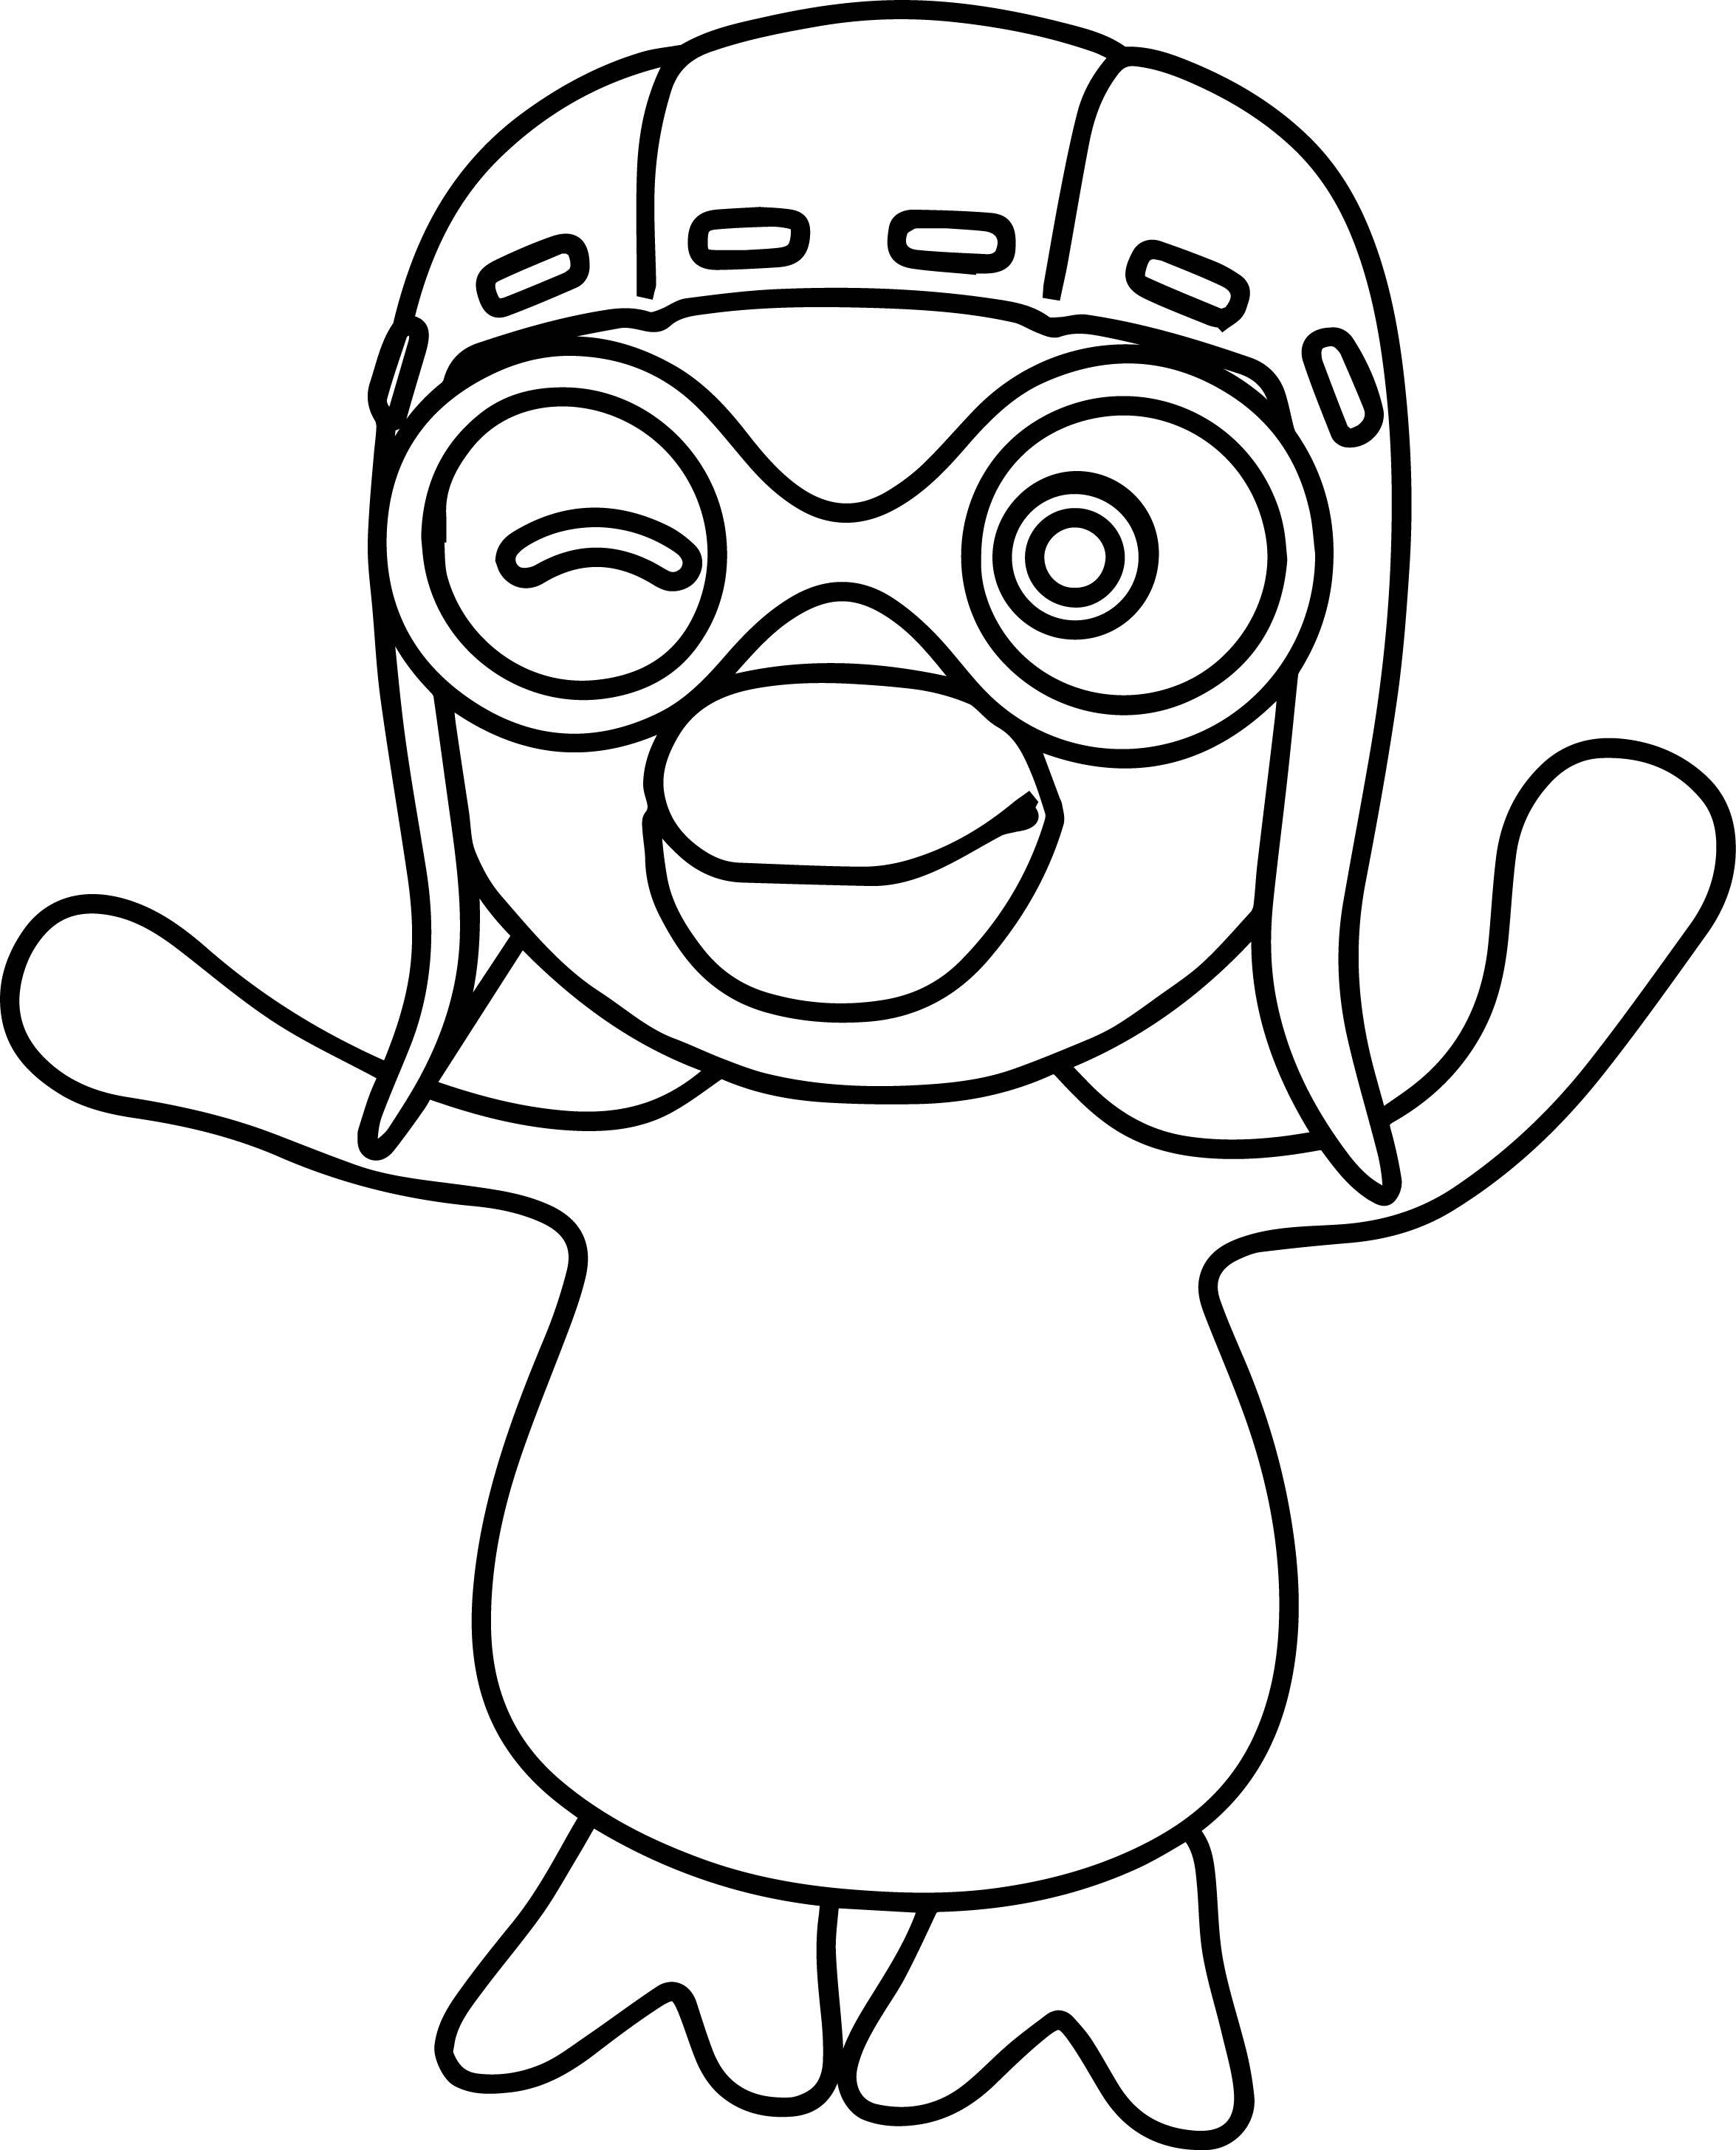 Coloriage pororo le petit pingouin imprimer - Coloriage minable le pingouin ...